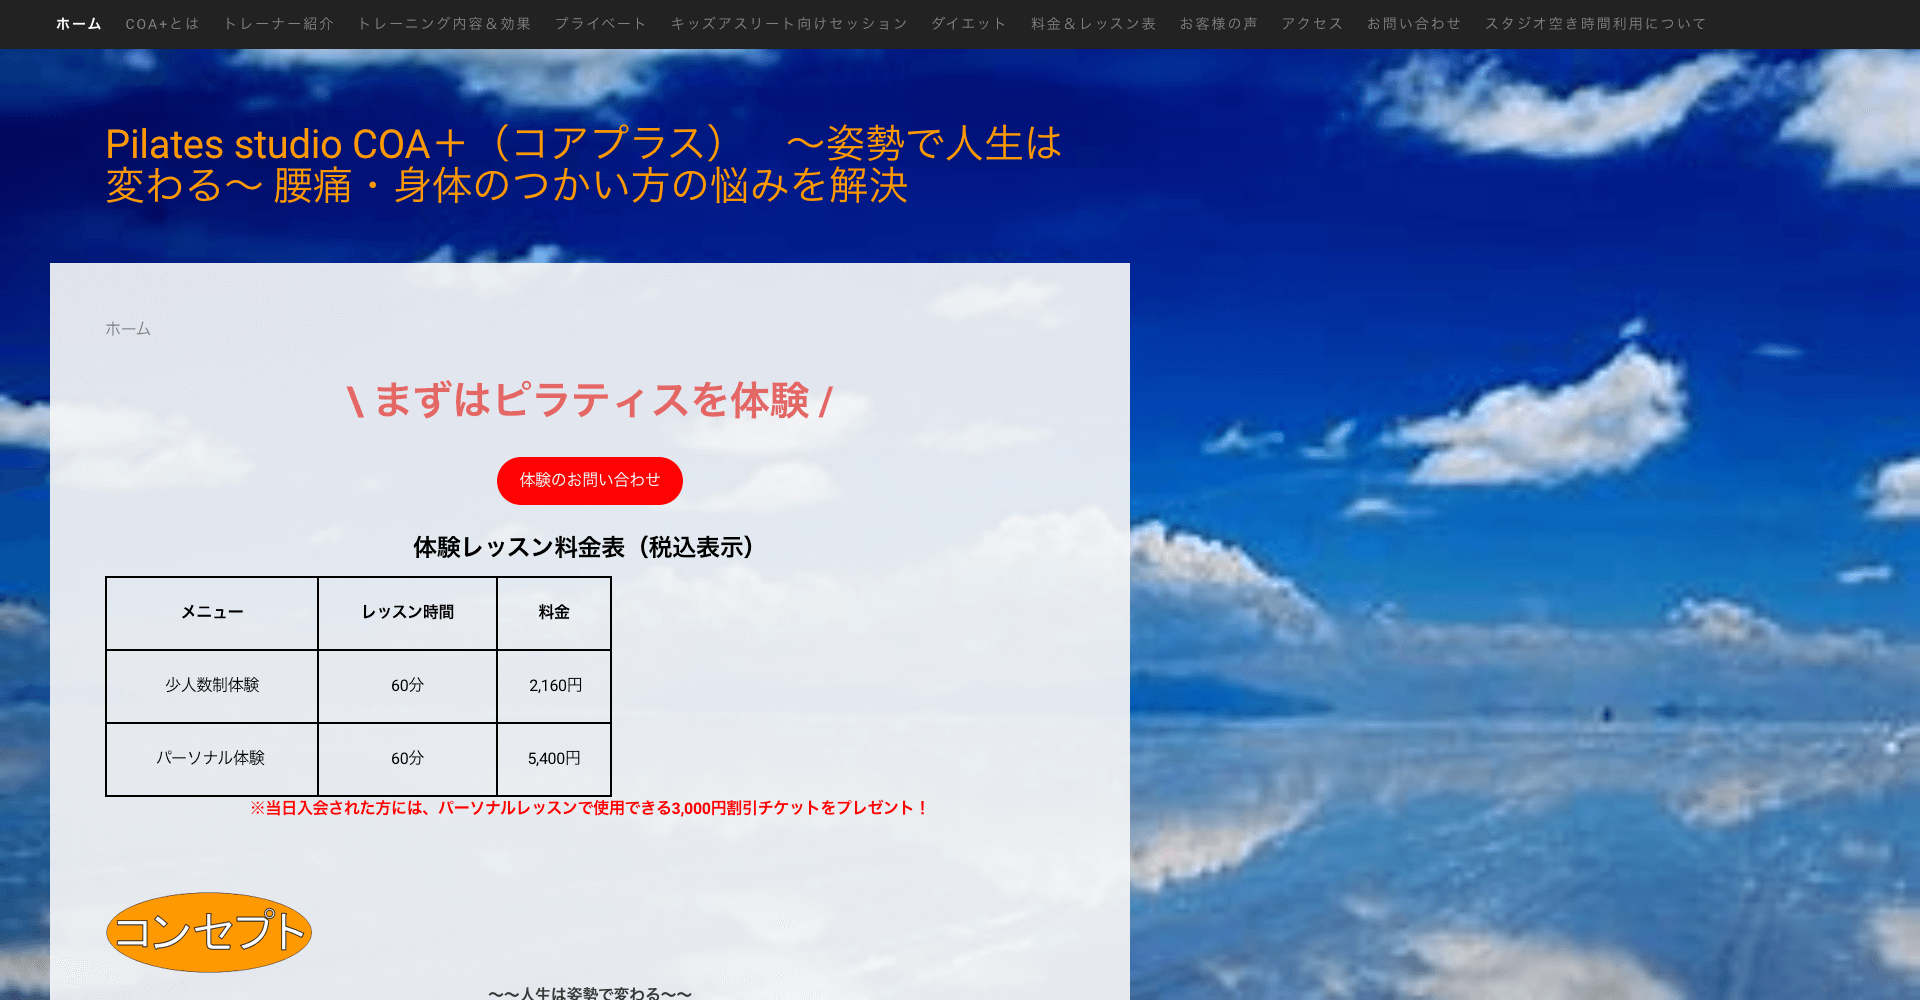 COA+(コアプラス)